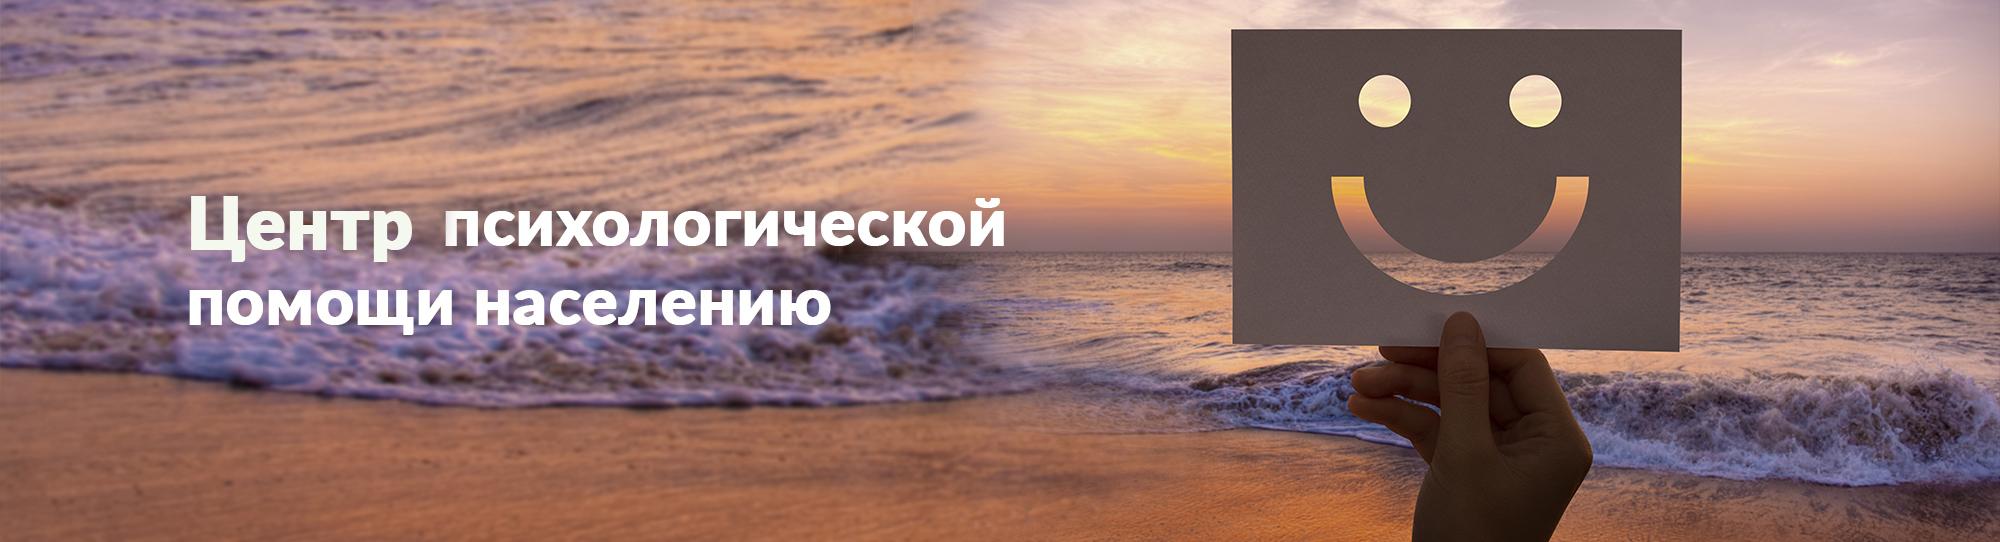 banner-tsentr-pomoshi